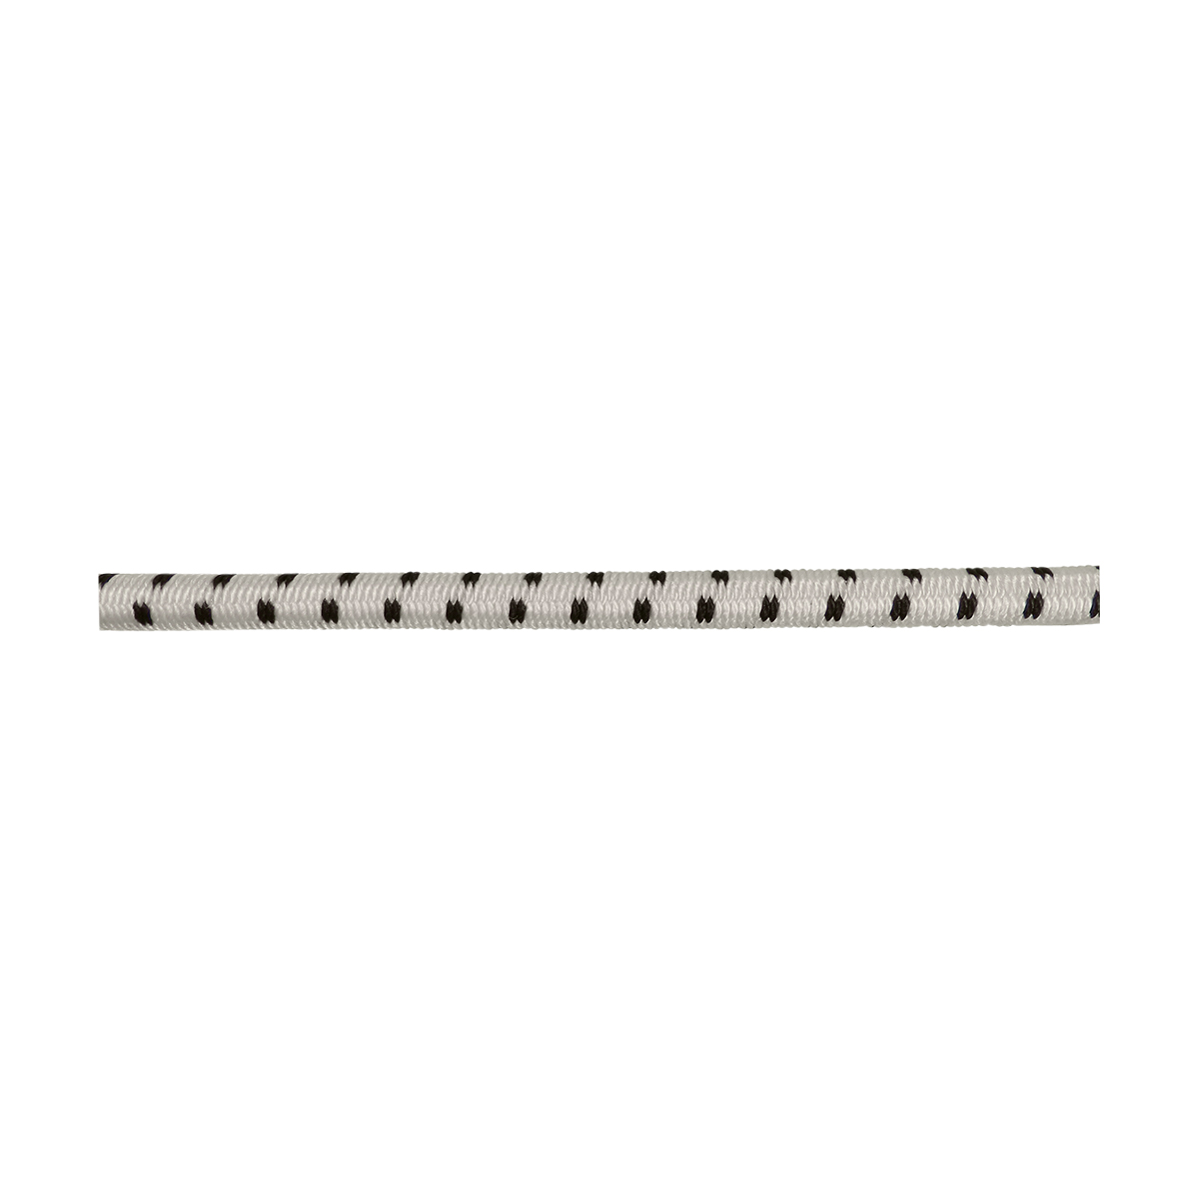 "Rubber Center Elastic Rope - Black/White - 3/16"" (price per foot)"